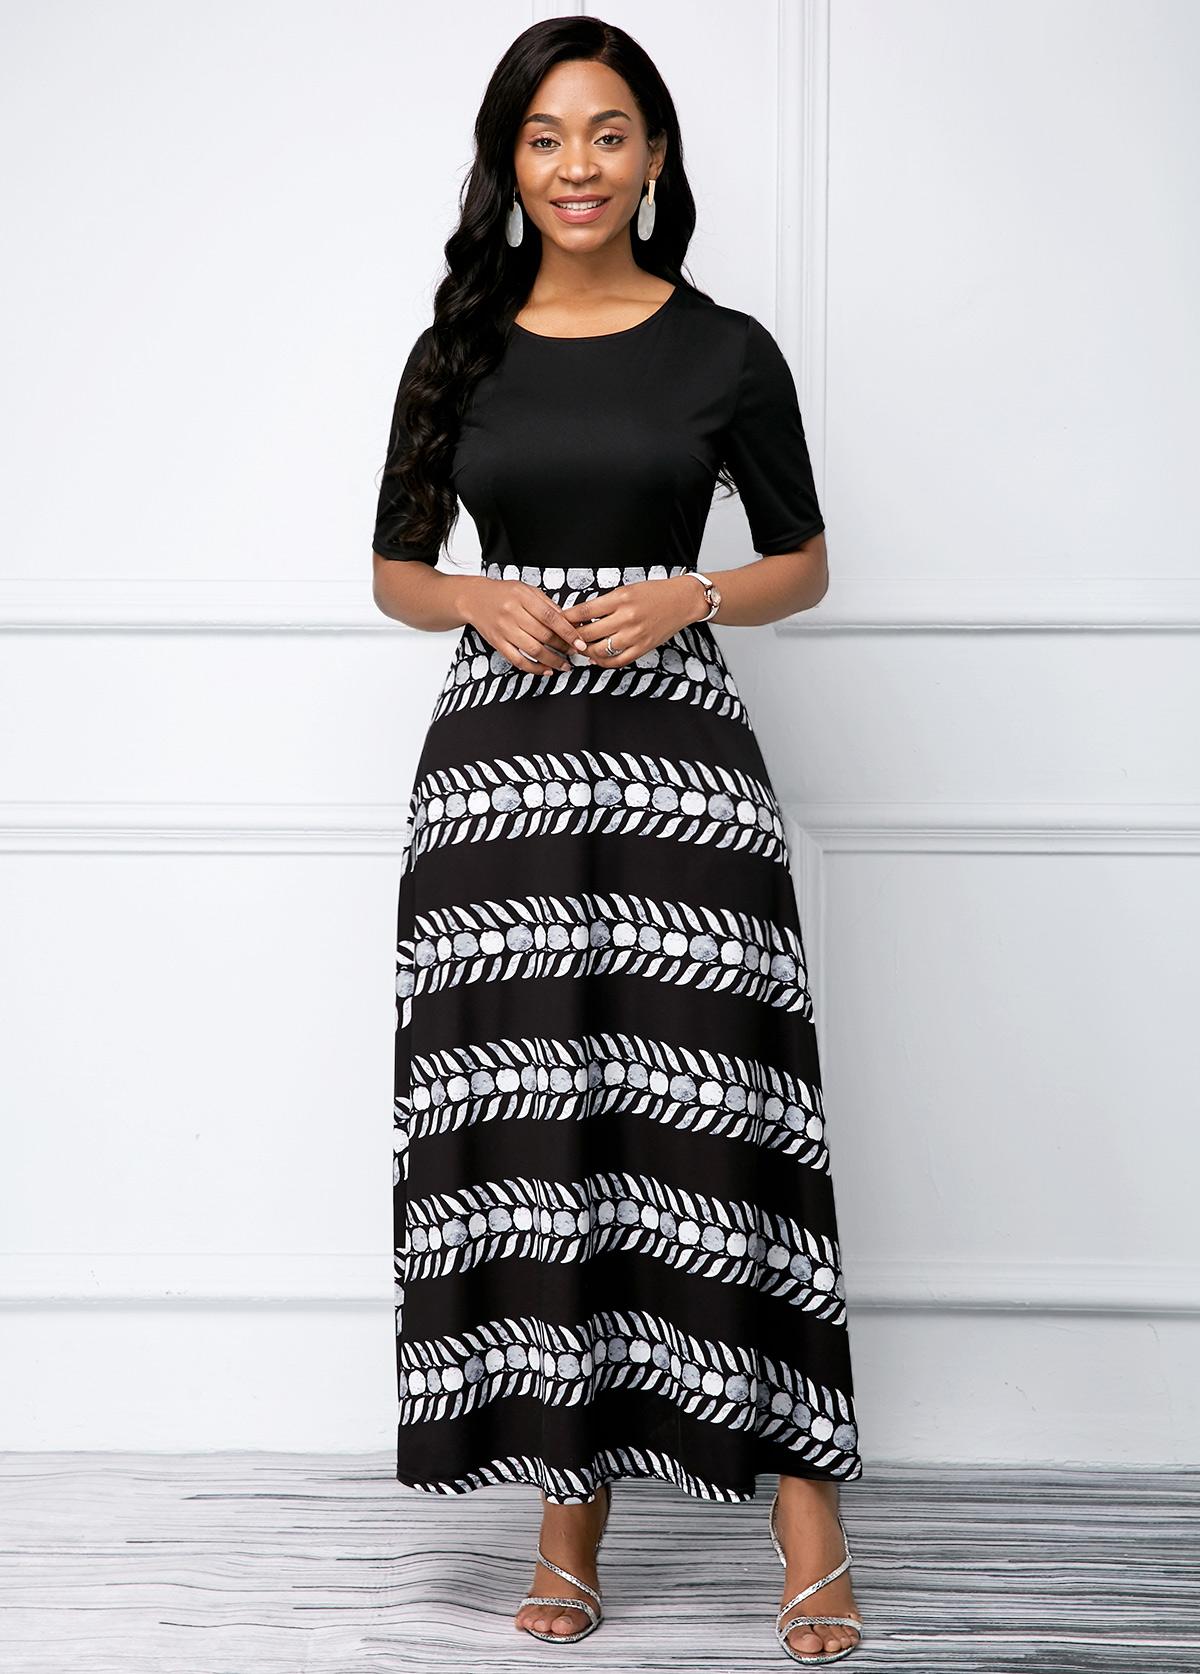 ROTITA Printed Round Neck Black Half Sleeve Dress